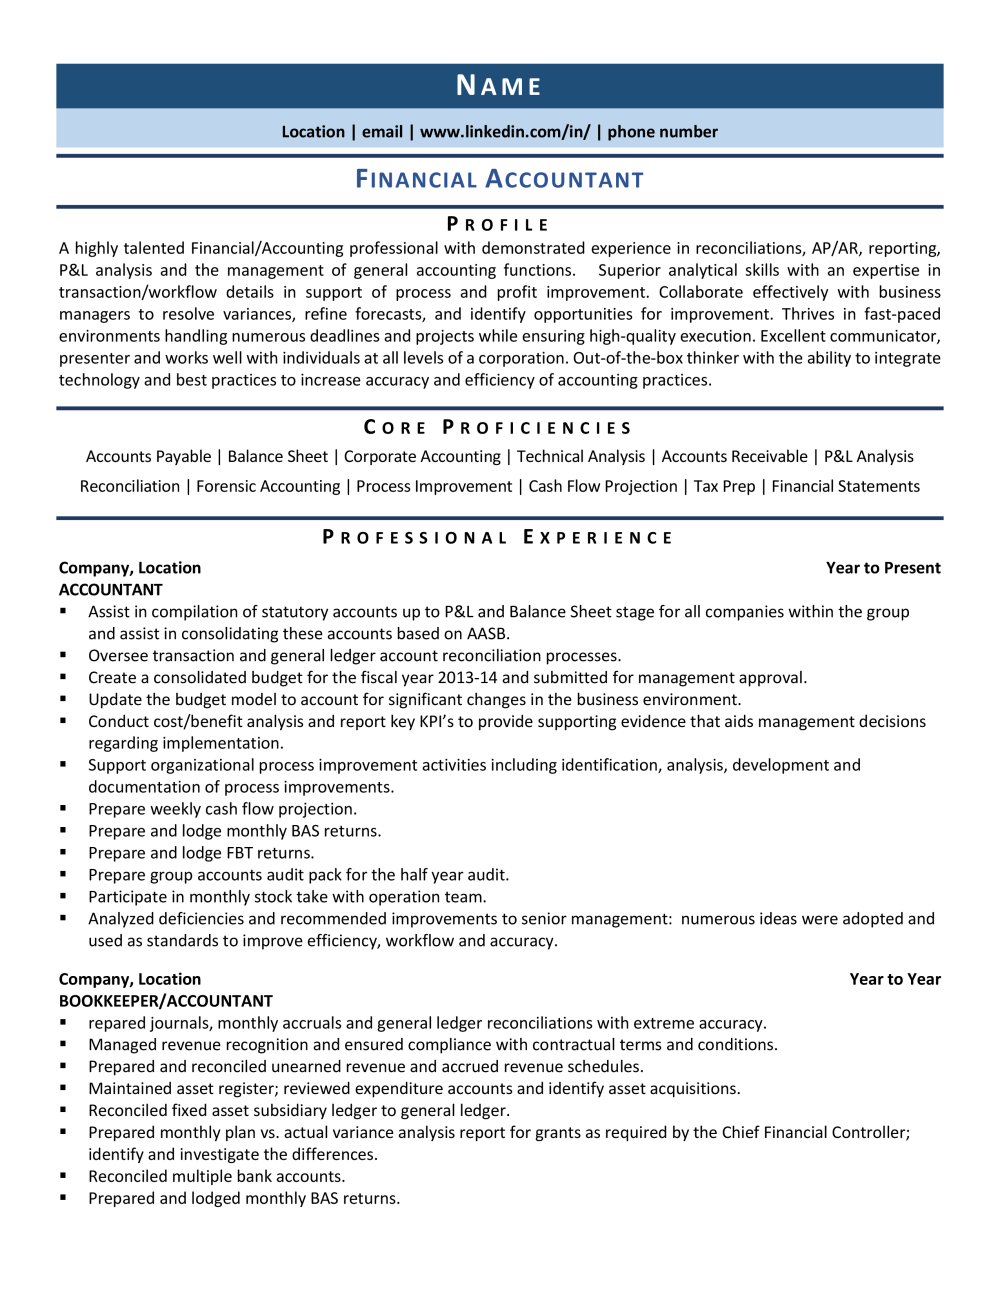 Financial accountant resume sample american fast food in china essay full auth3 filmbay yo12i aj html